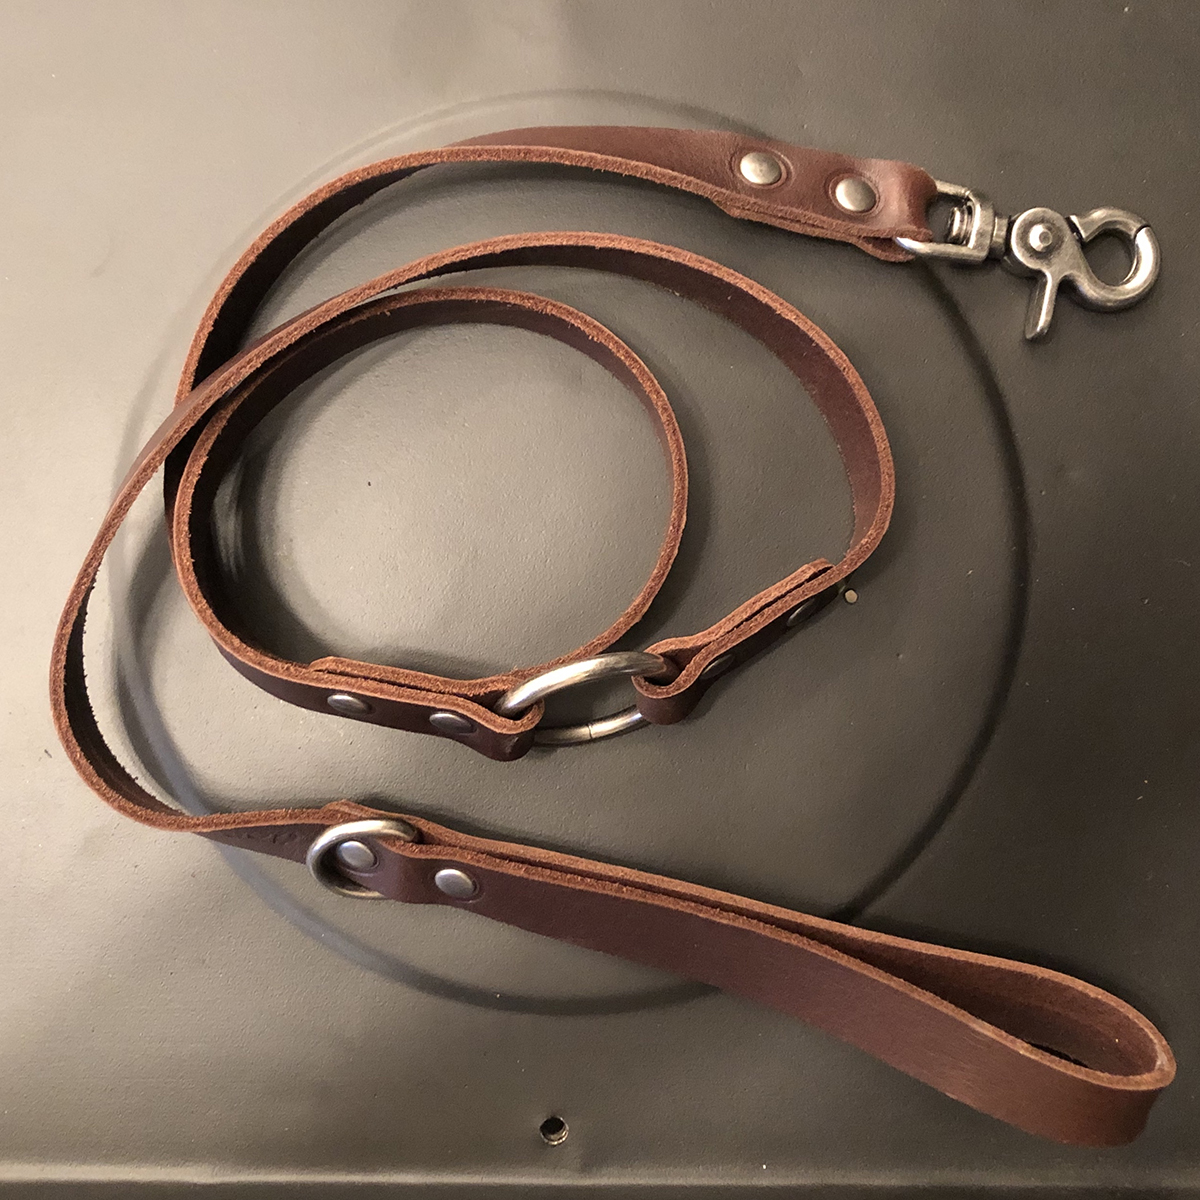 AIRMKT eCom PN XXXXXX Dean Accessories _leash brown WEB